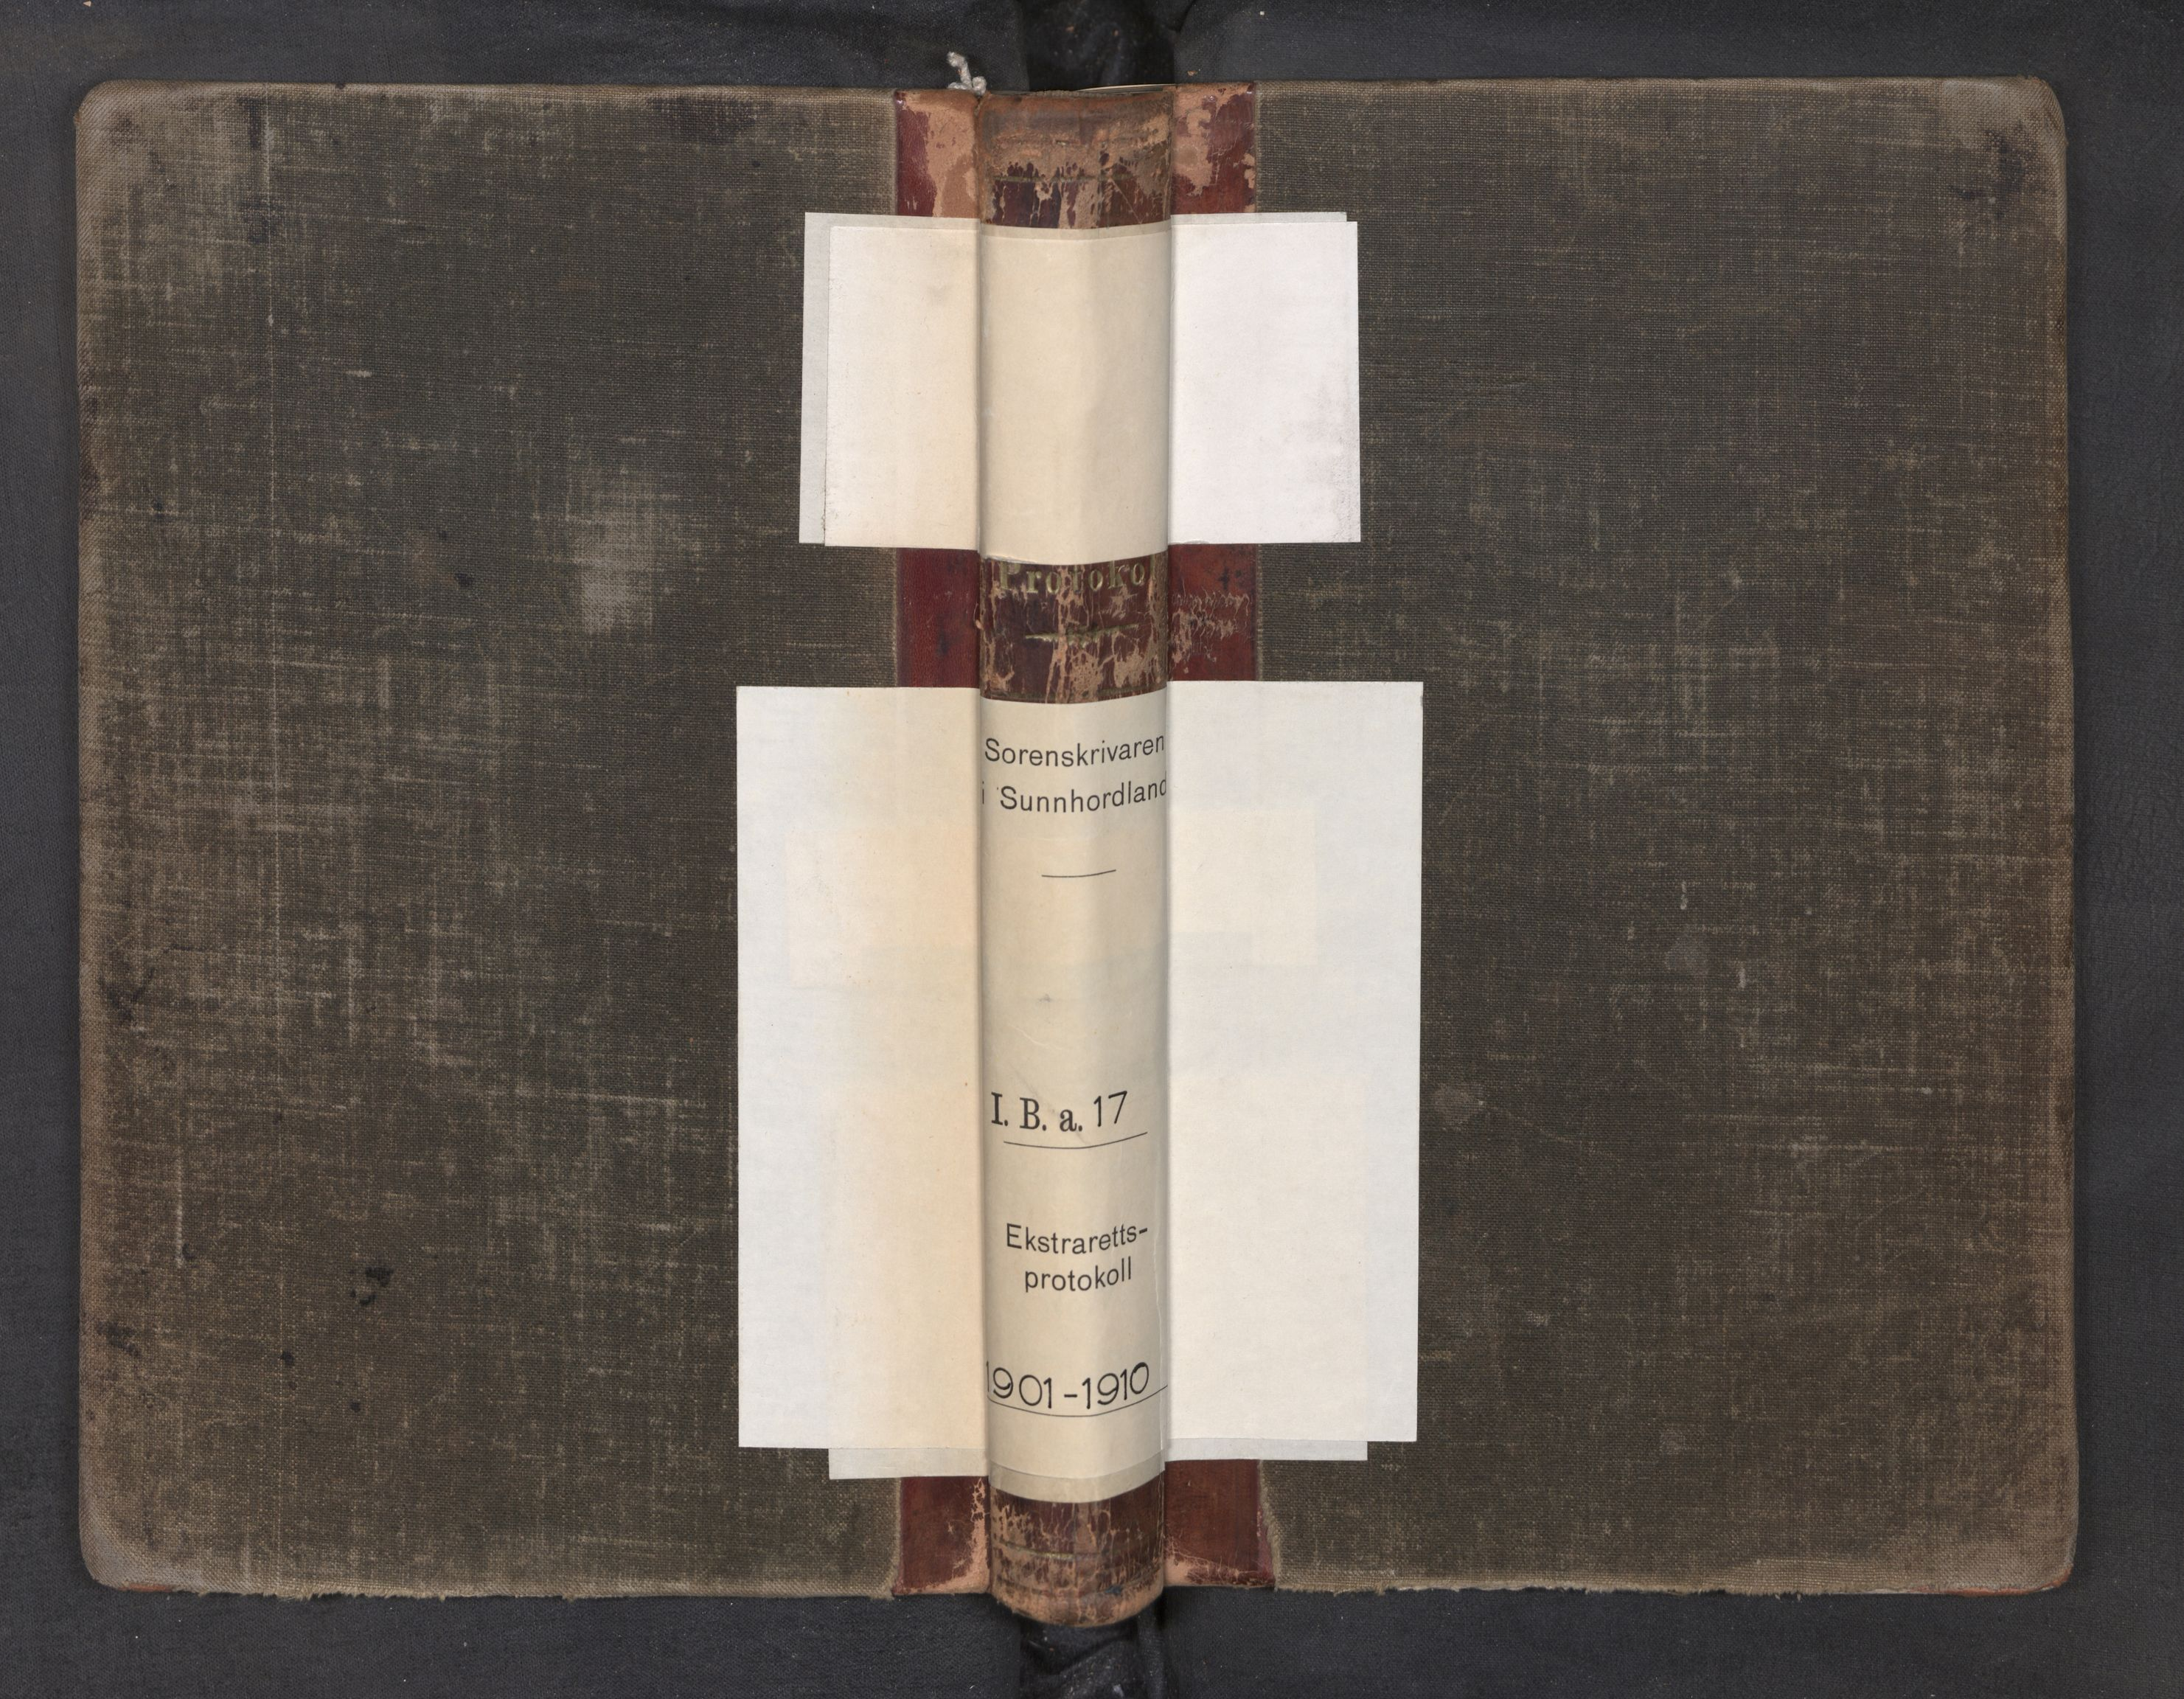 SAB, Sunnhordland sorenskrivar, F/Fb/Fba/L0017: Ekstrarettsprotokoll, 1901-1910